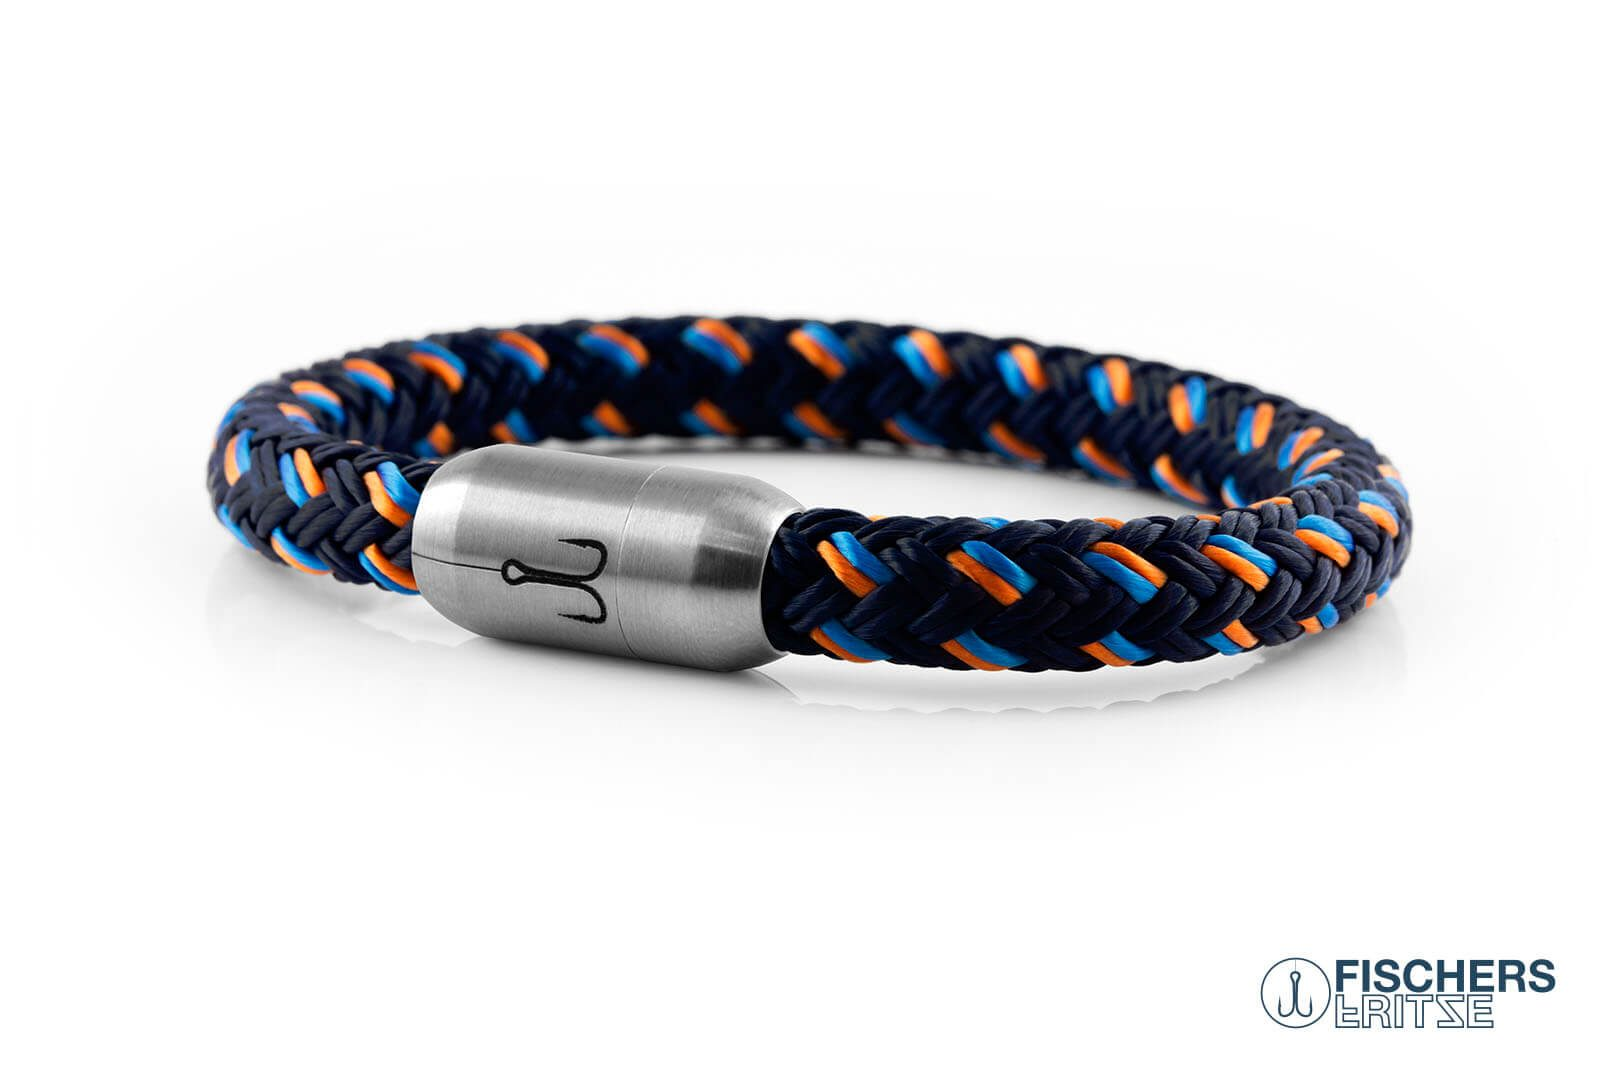 Armband Fischers Fritze Makrele aus Segeltau, marineblau orange stahlblau, Gravur in Edelstahl-Verschluss